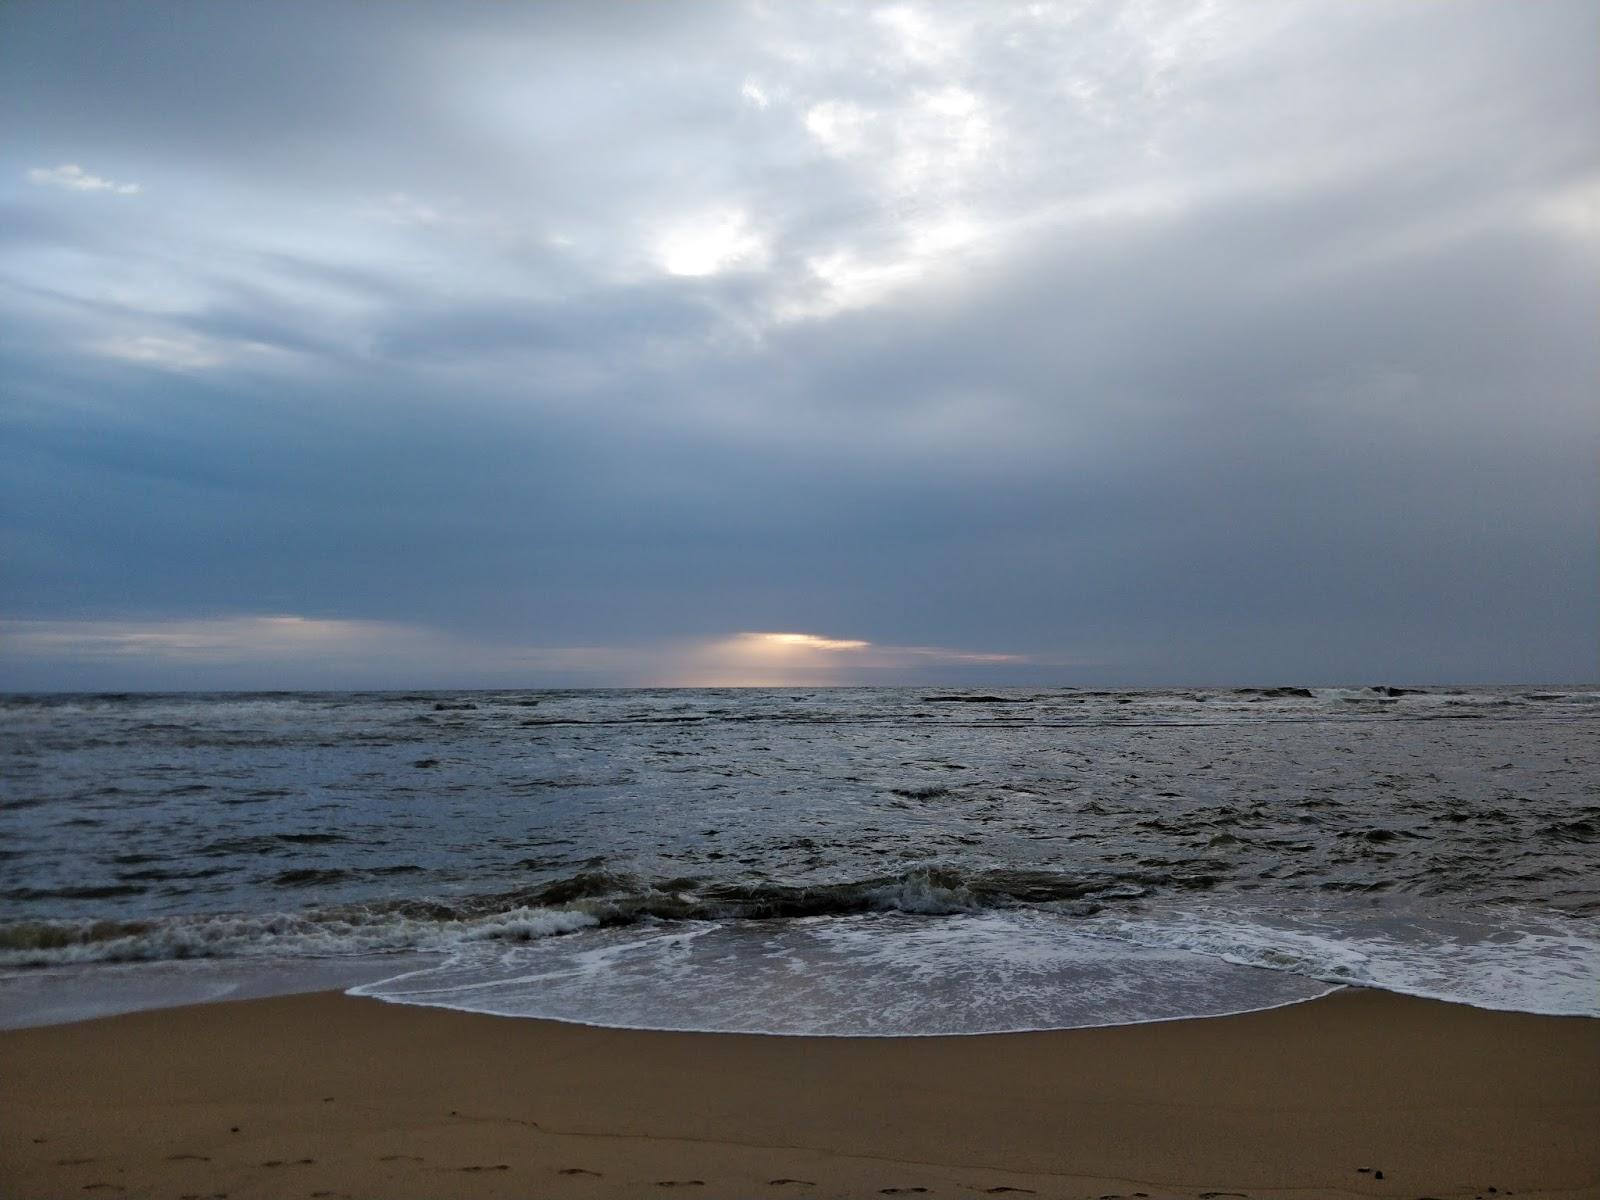 Sea view and a provate beach at Earl's Reef Beruwala